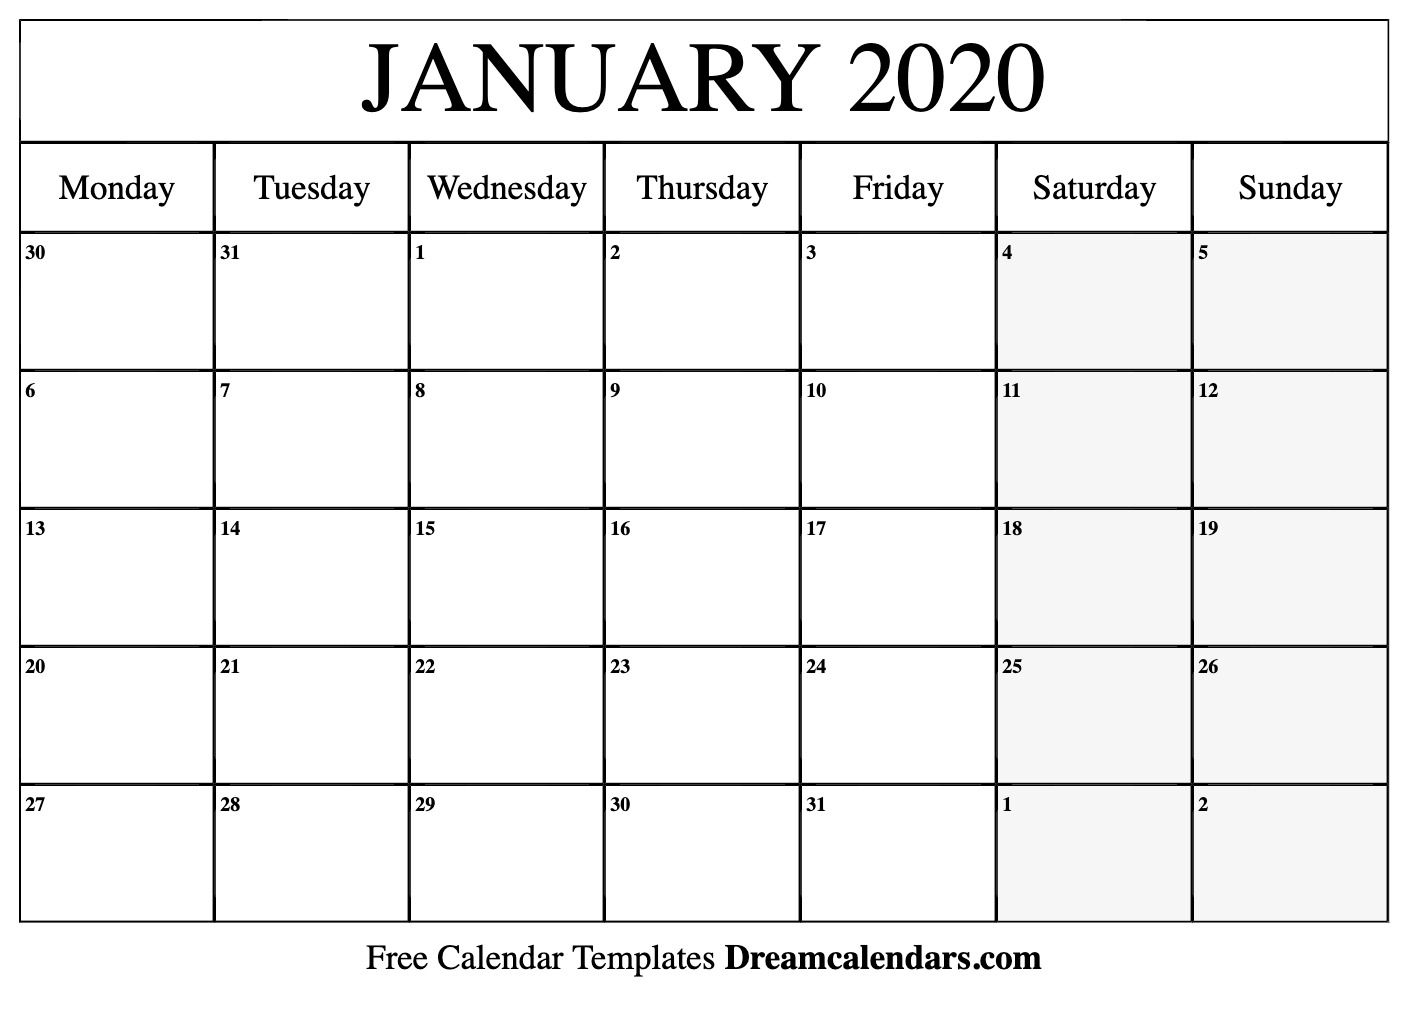 January 2020 Calendar | Free Blank Printable Templates